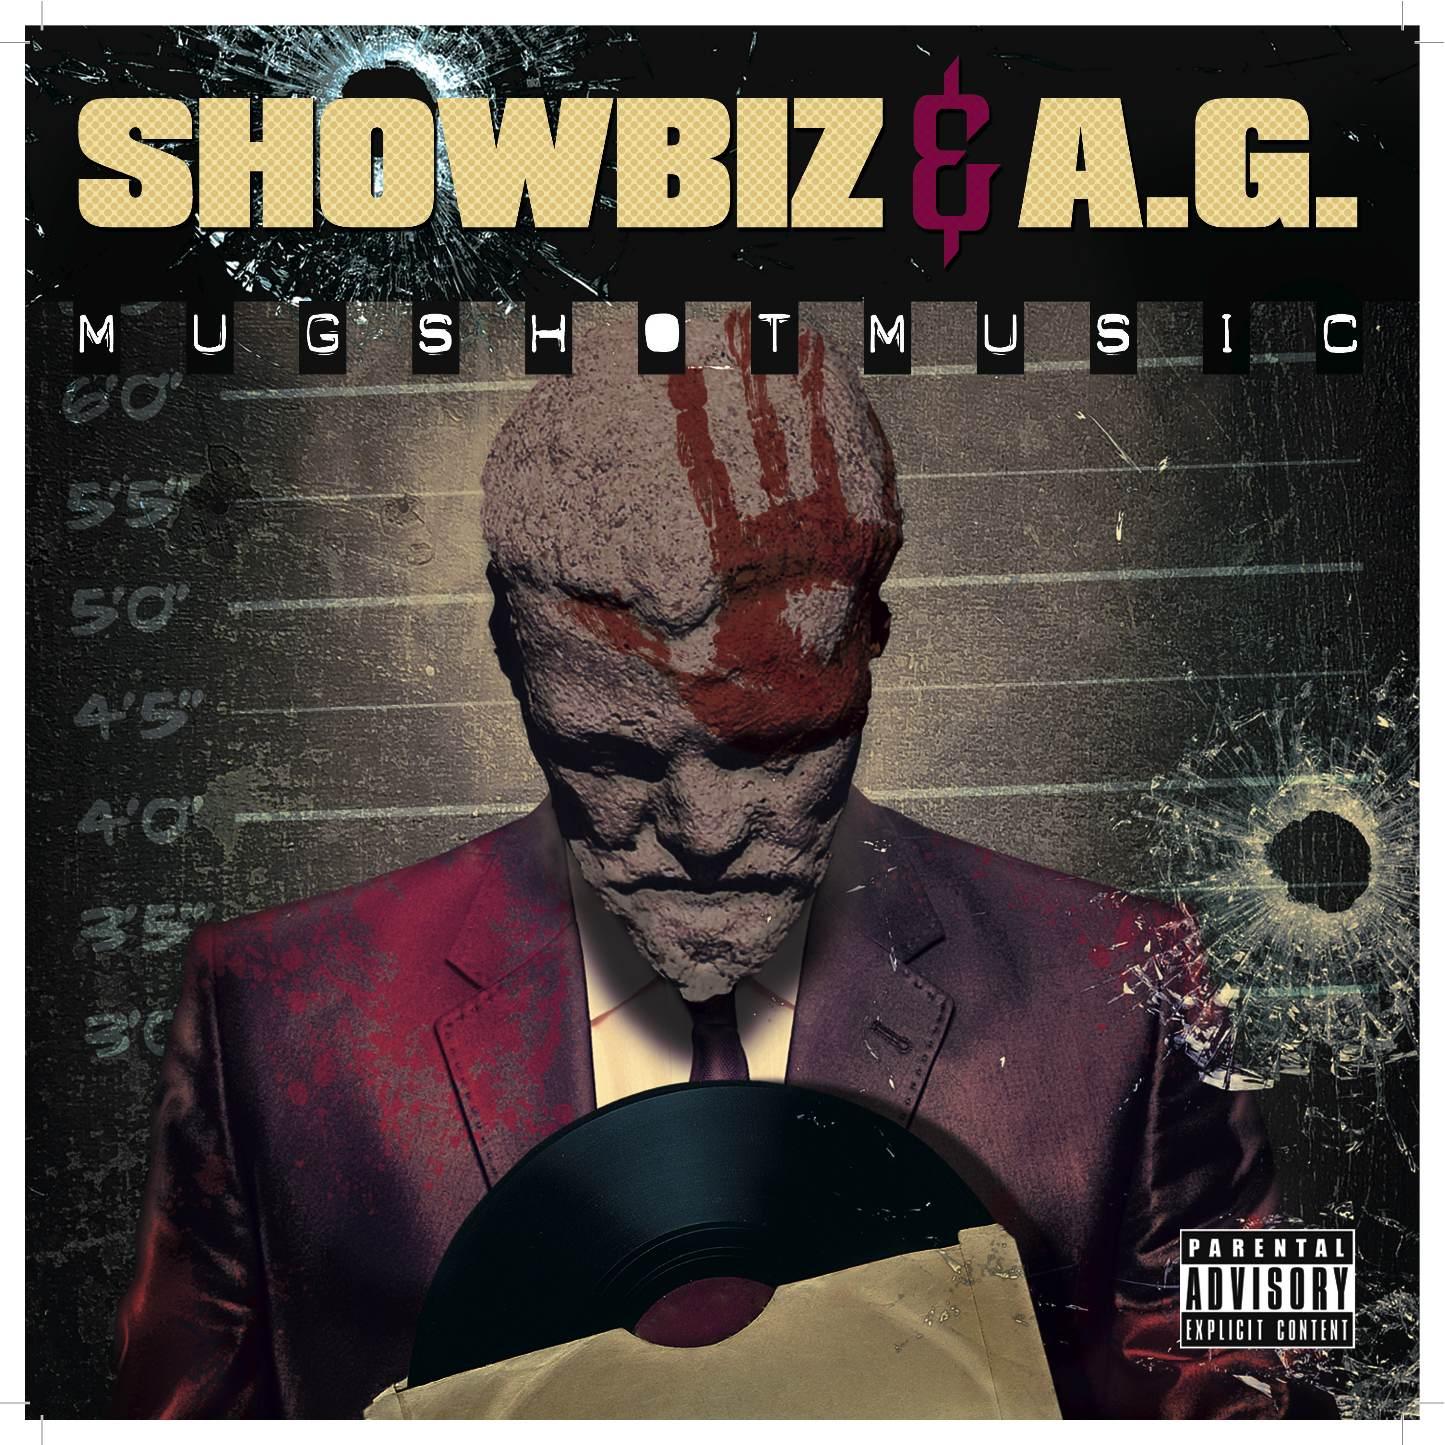 Showbiz & AG - All Time Greats